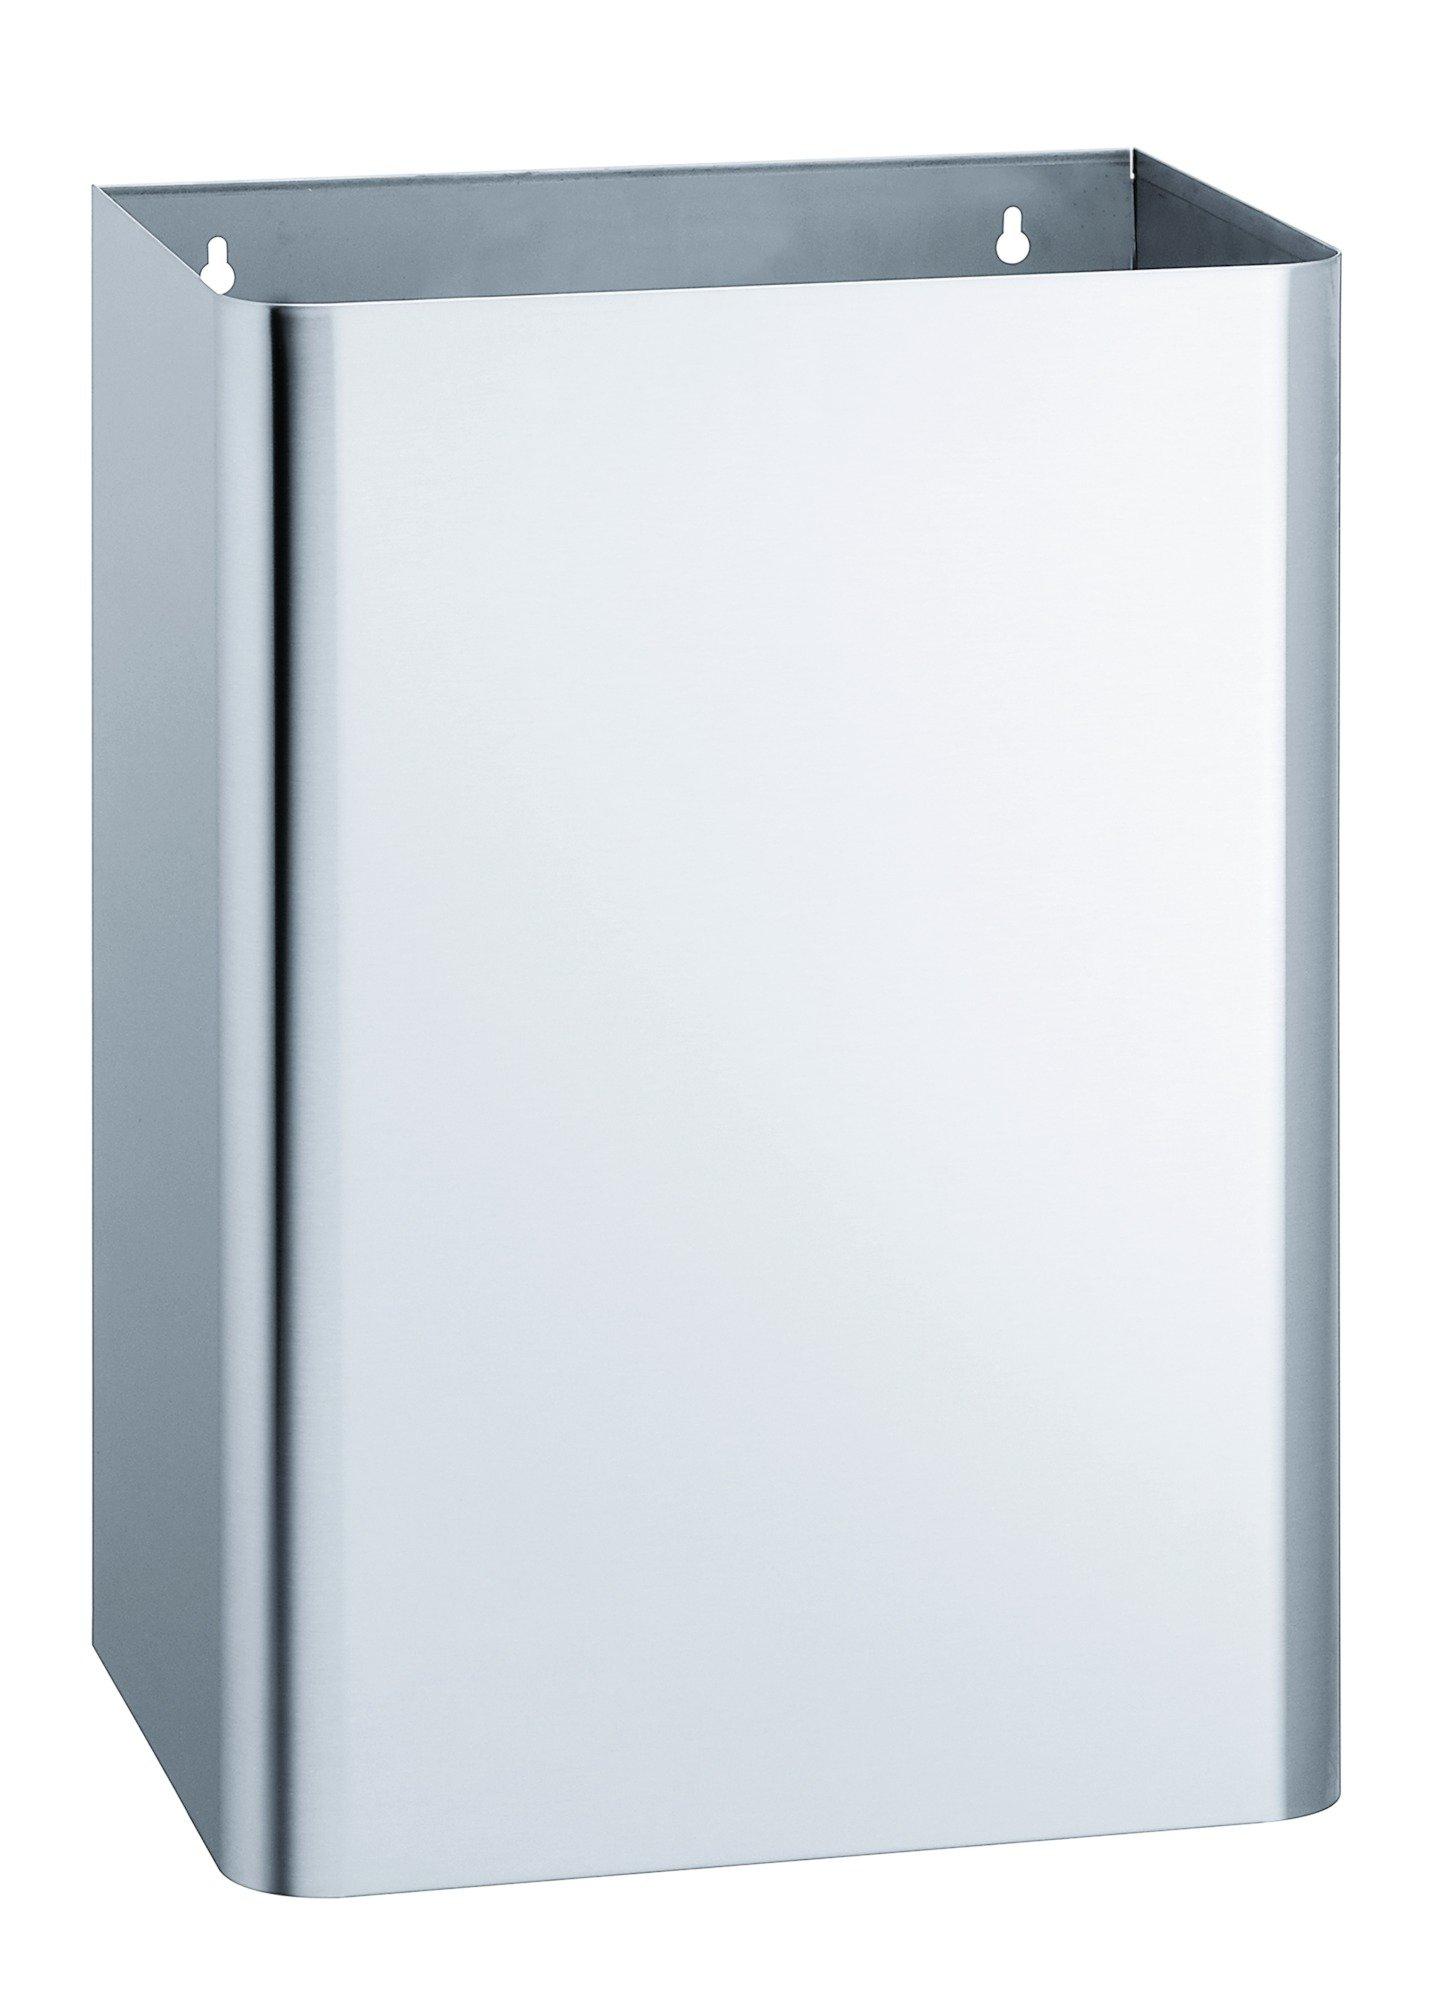 Bradley Paper Towel Dispenser Waste Receptacle 355